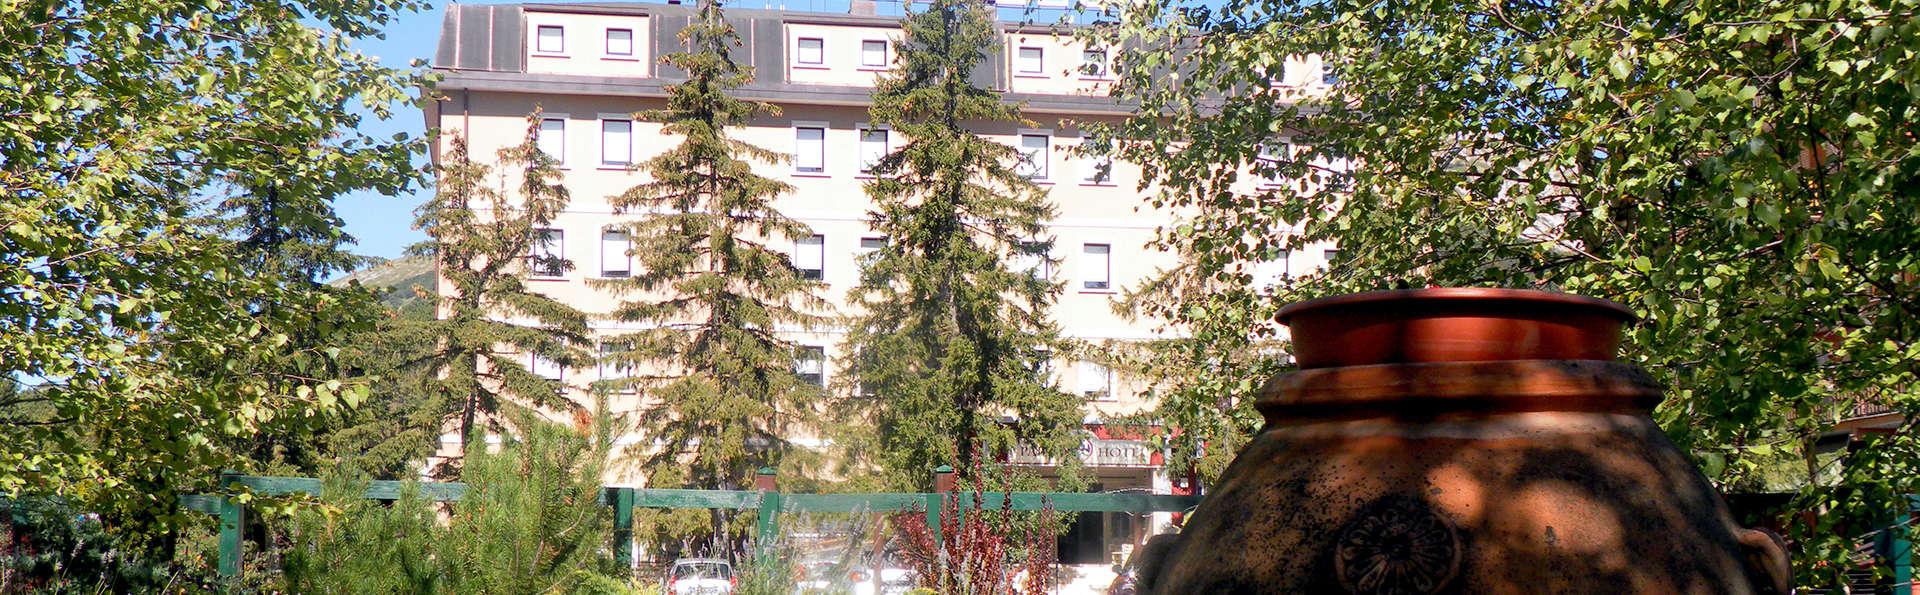 Park Hotel Ovindoli - Edit_Front2.jpg